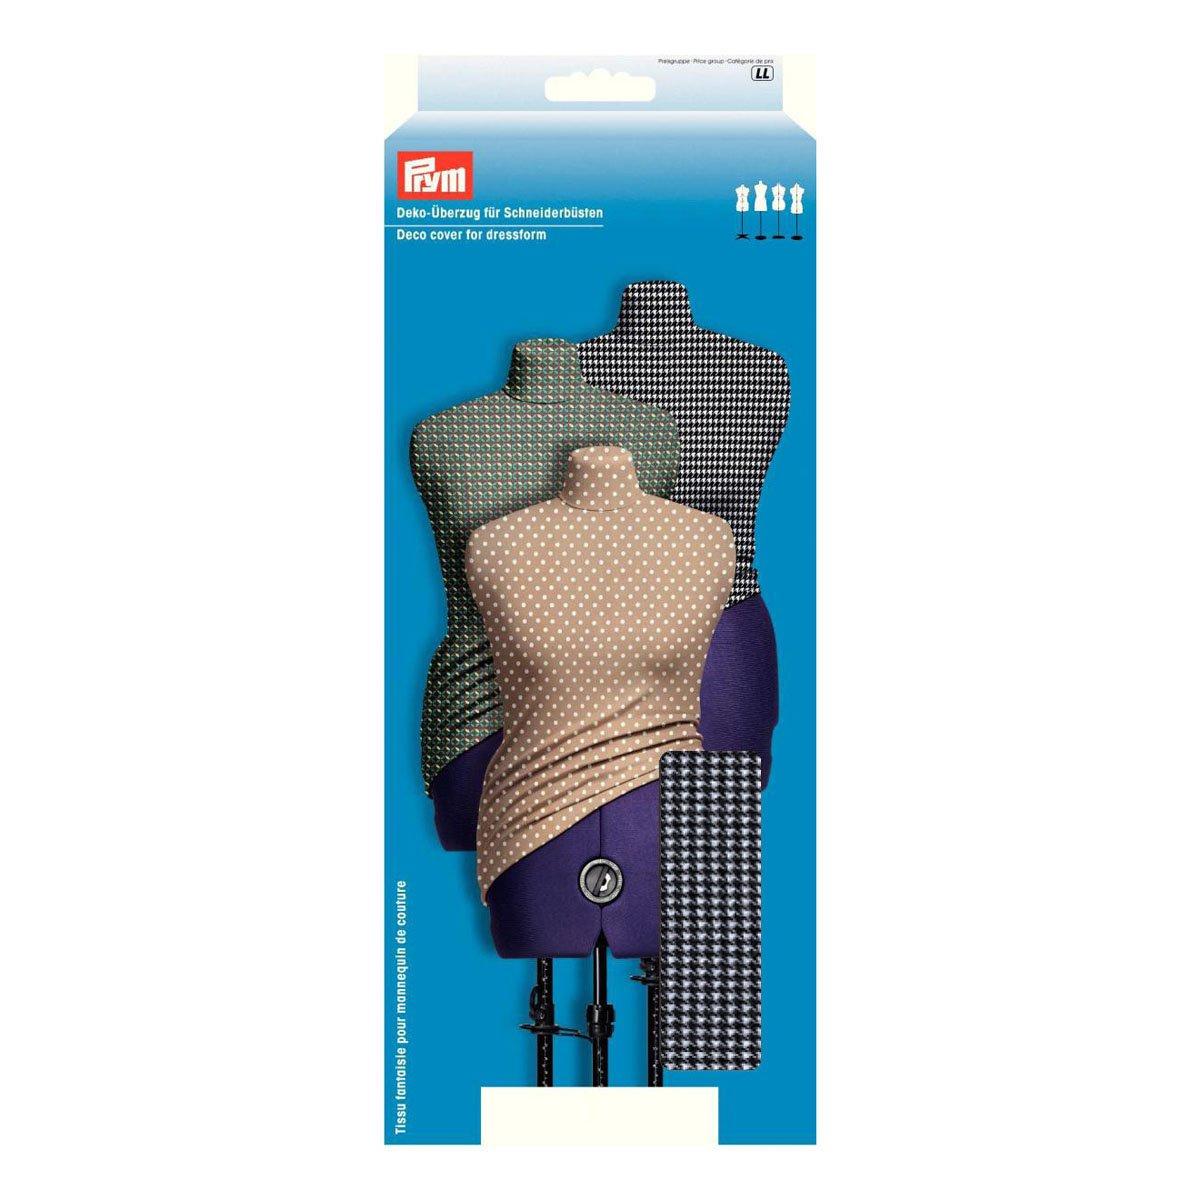 Prym 610235 | Black White Houndstooth Dressform Cover Large UK Size 22-28